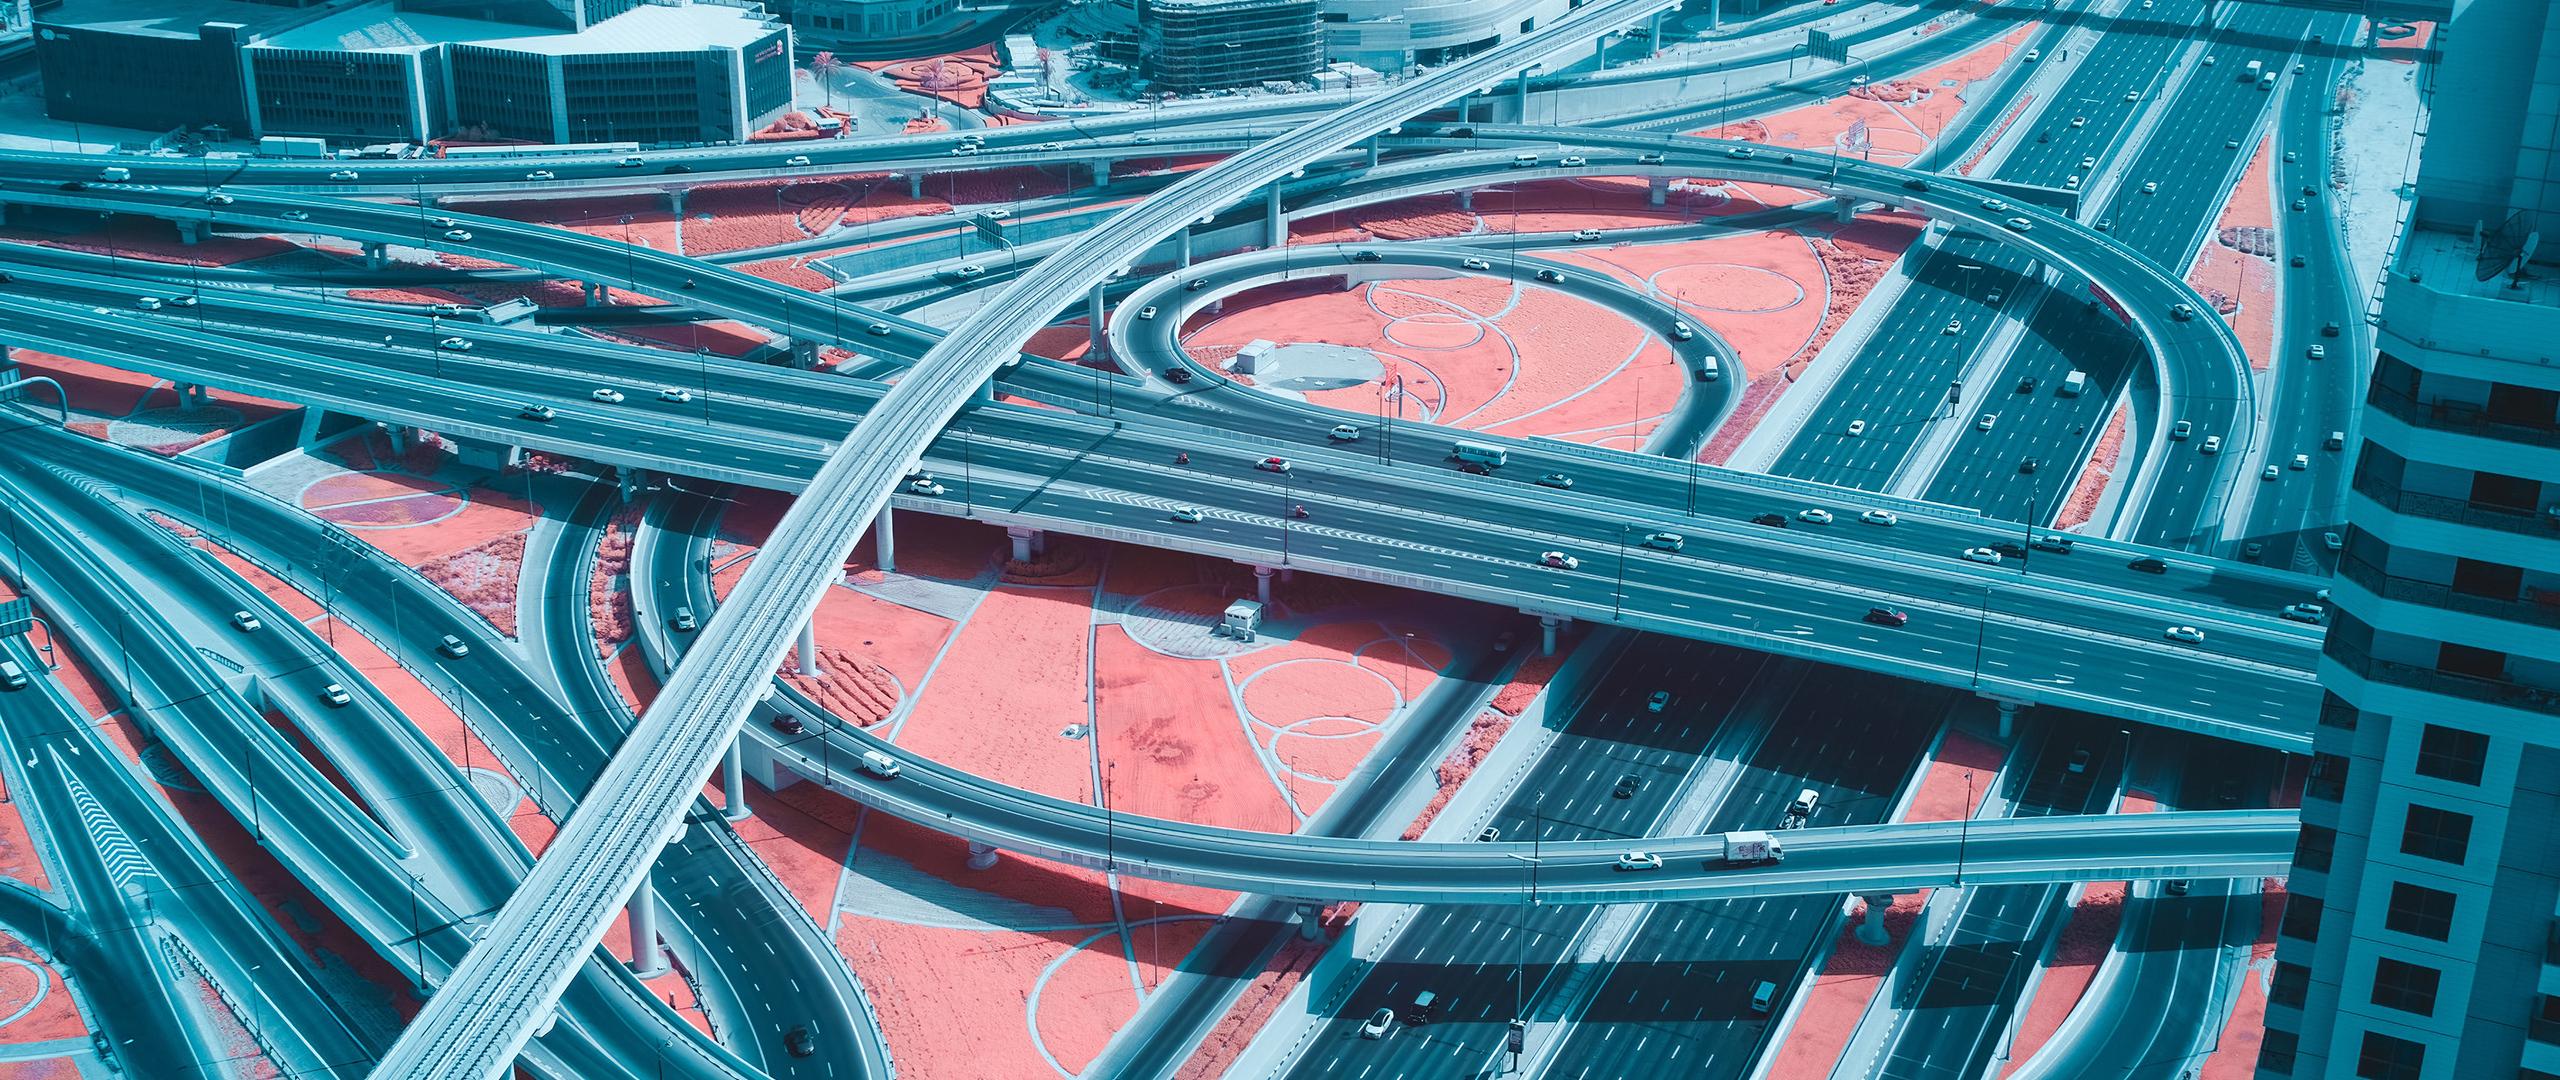 sheikh-zayed-road-highway-dubai-9w.jpg